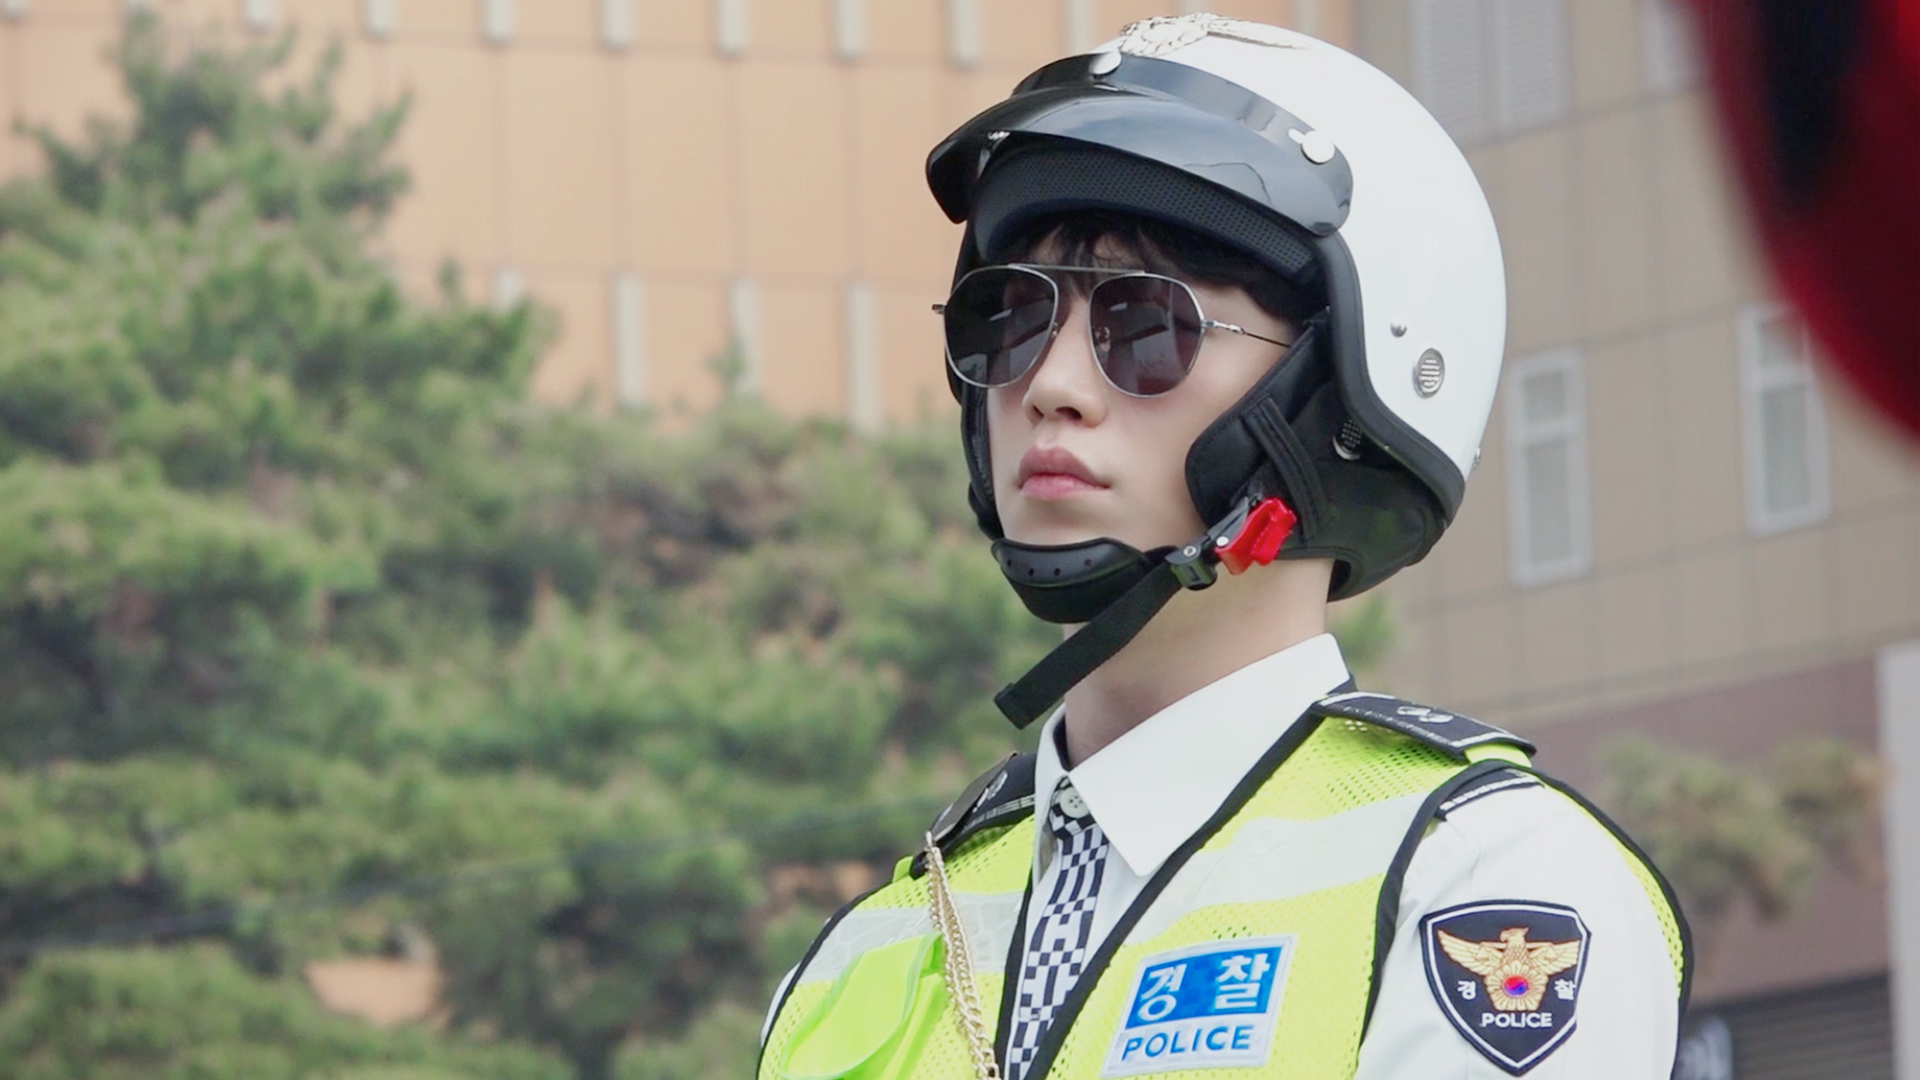 SEO KANG JUN 서강준 - 드라마 '왓쳐' 비하인드 - 첫촬영